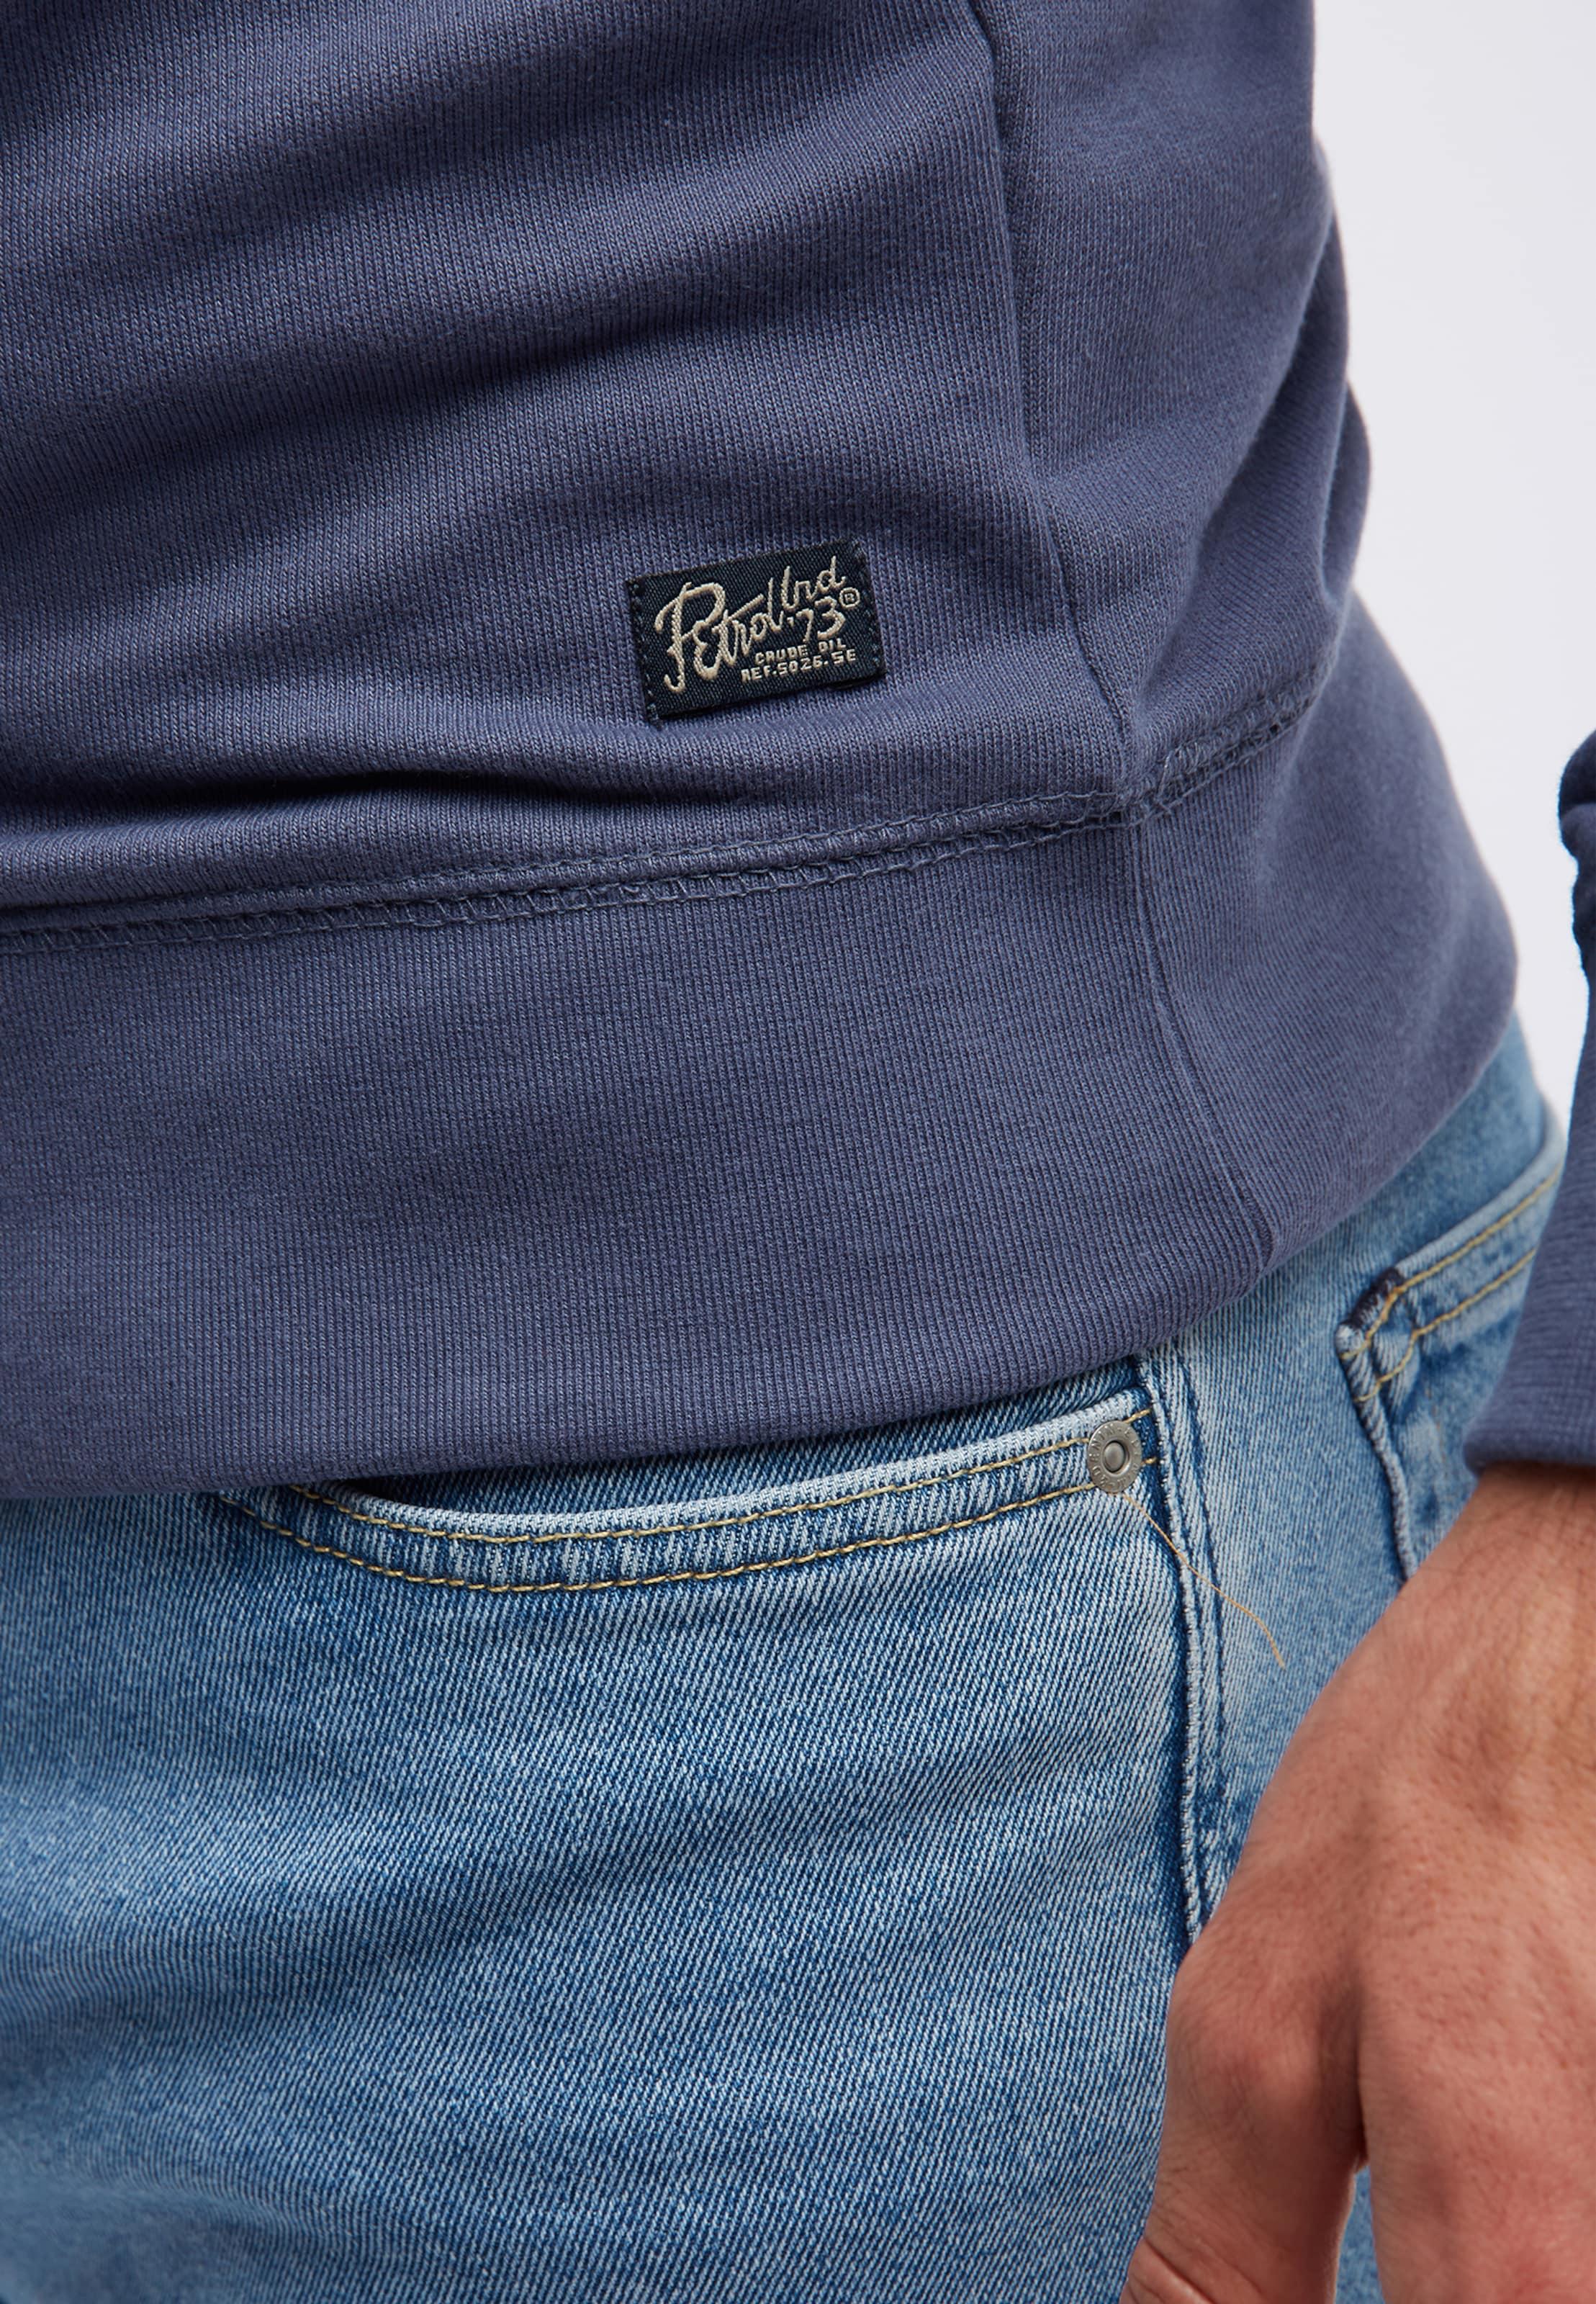 Petrol Sweat Gris Industries shirt En LMqUVSzpG